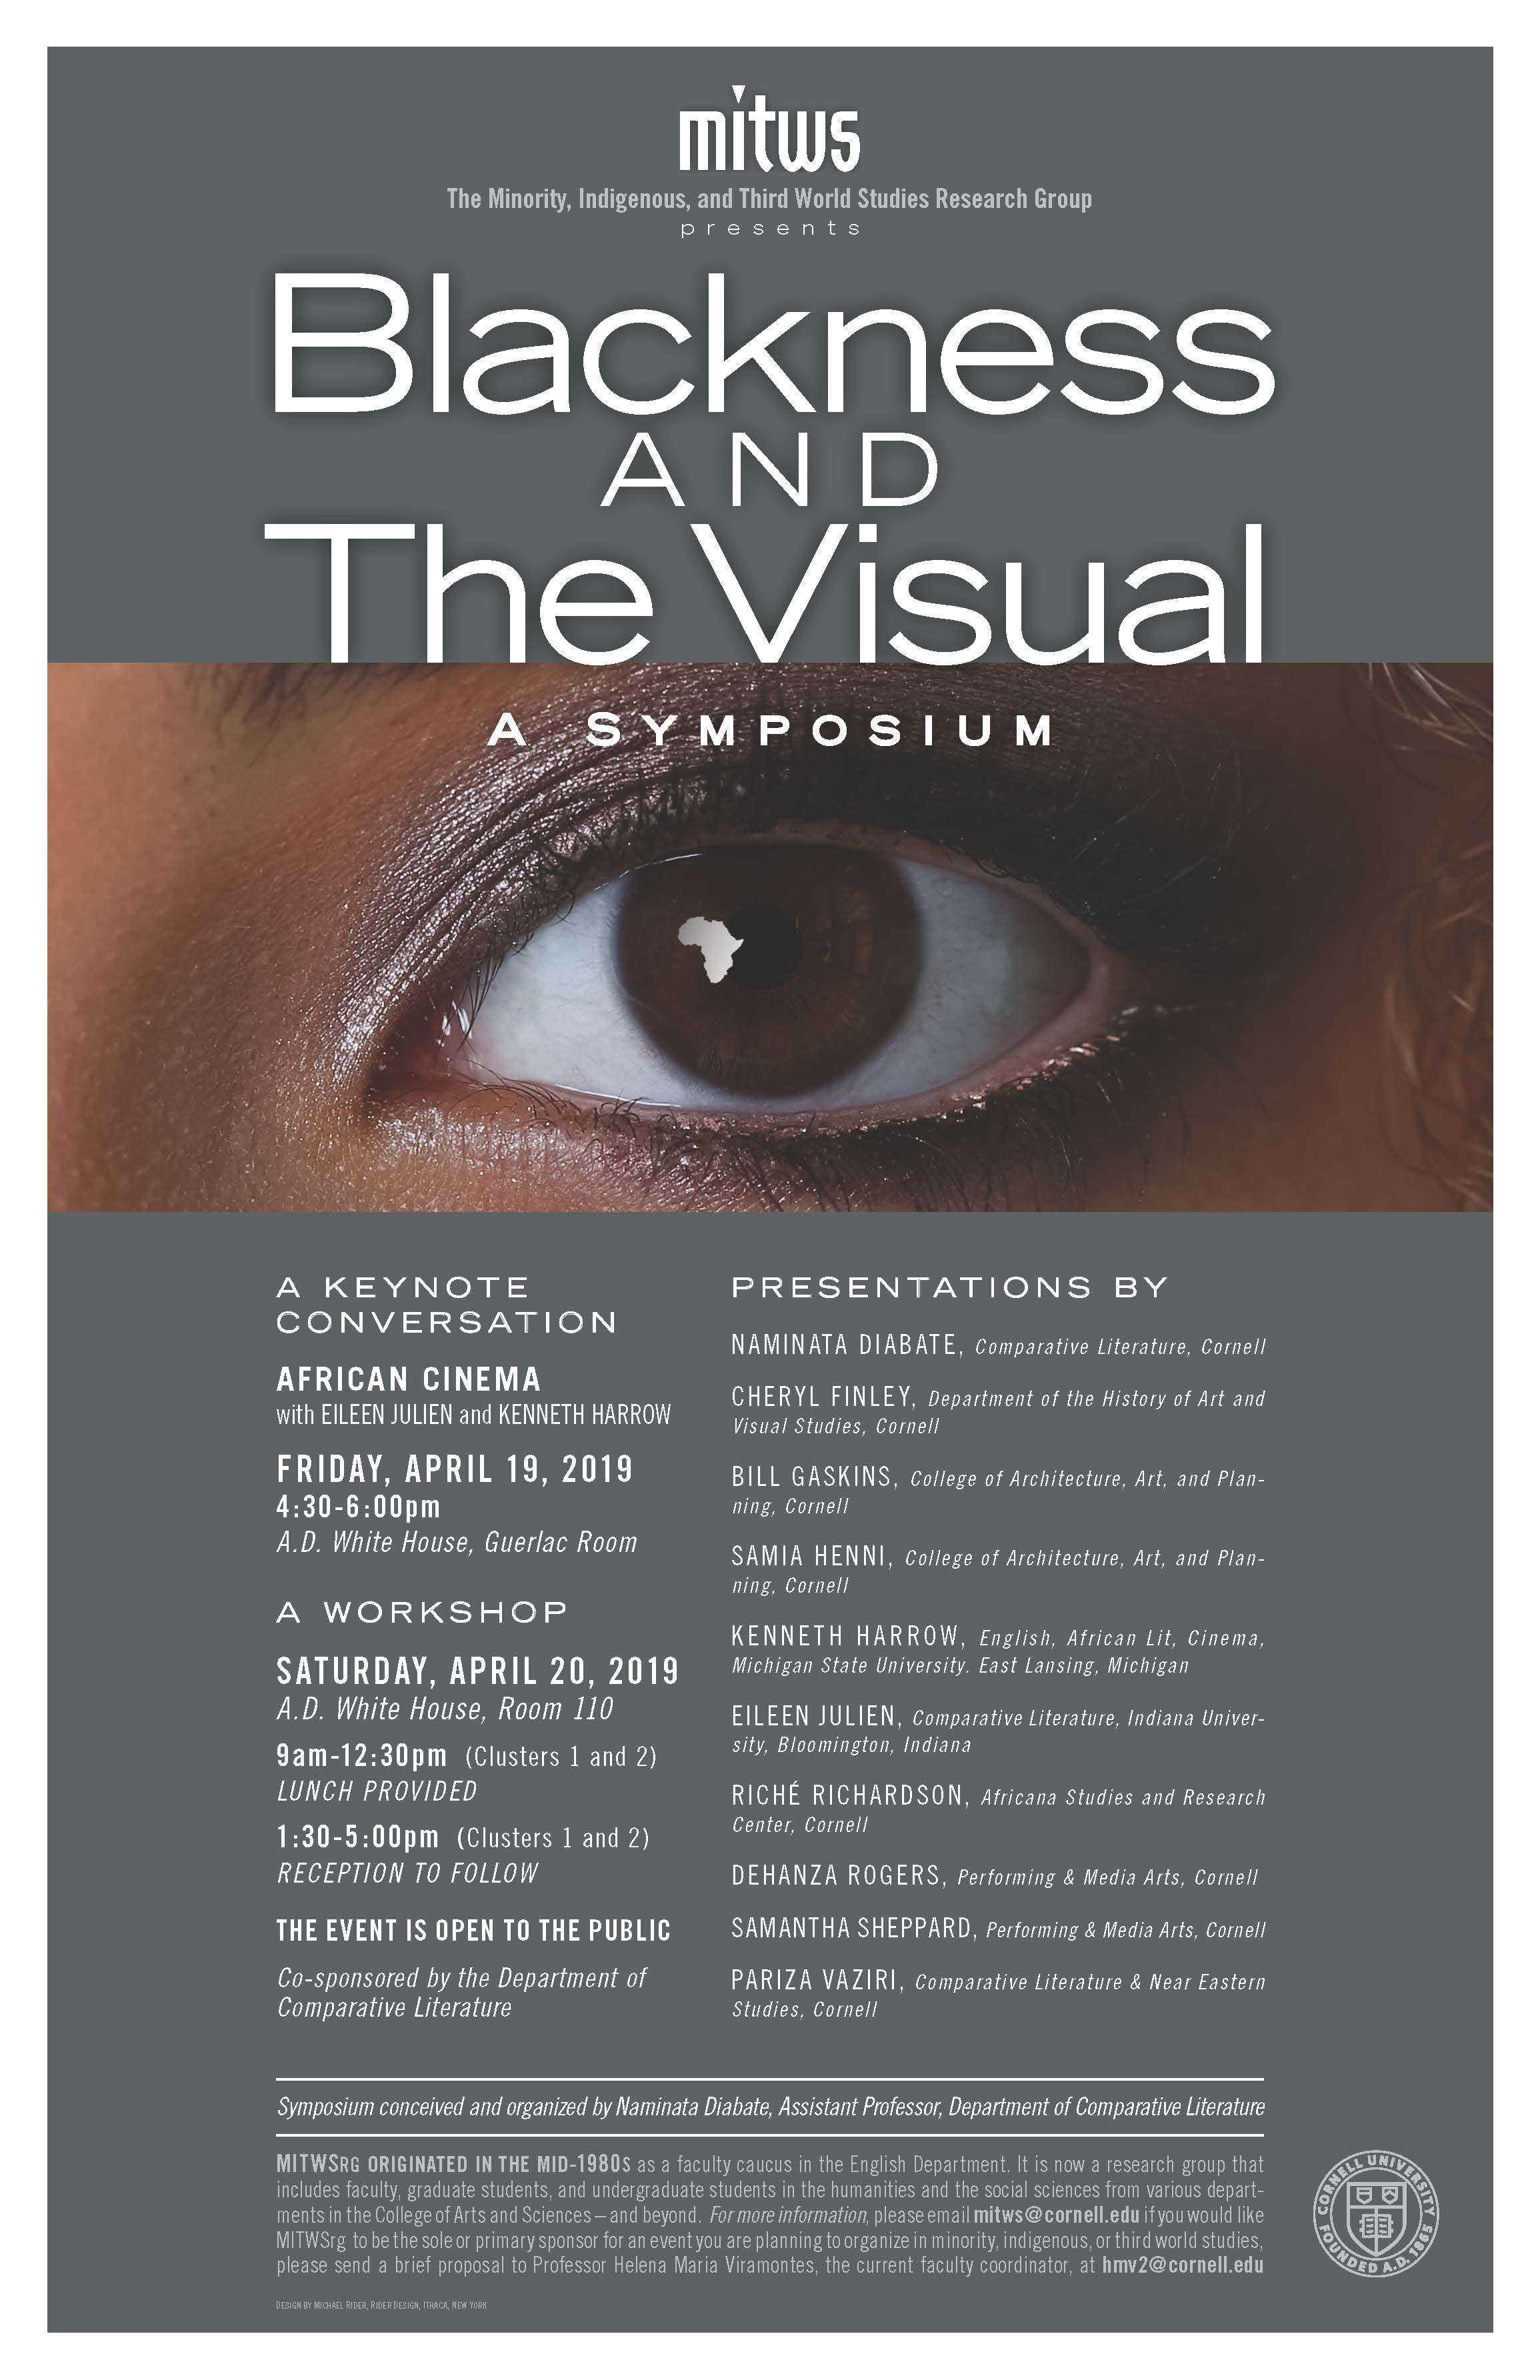 Blackness and the Visual Symposium: Workshop